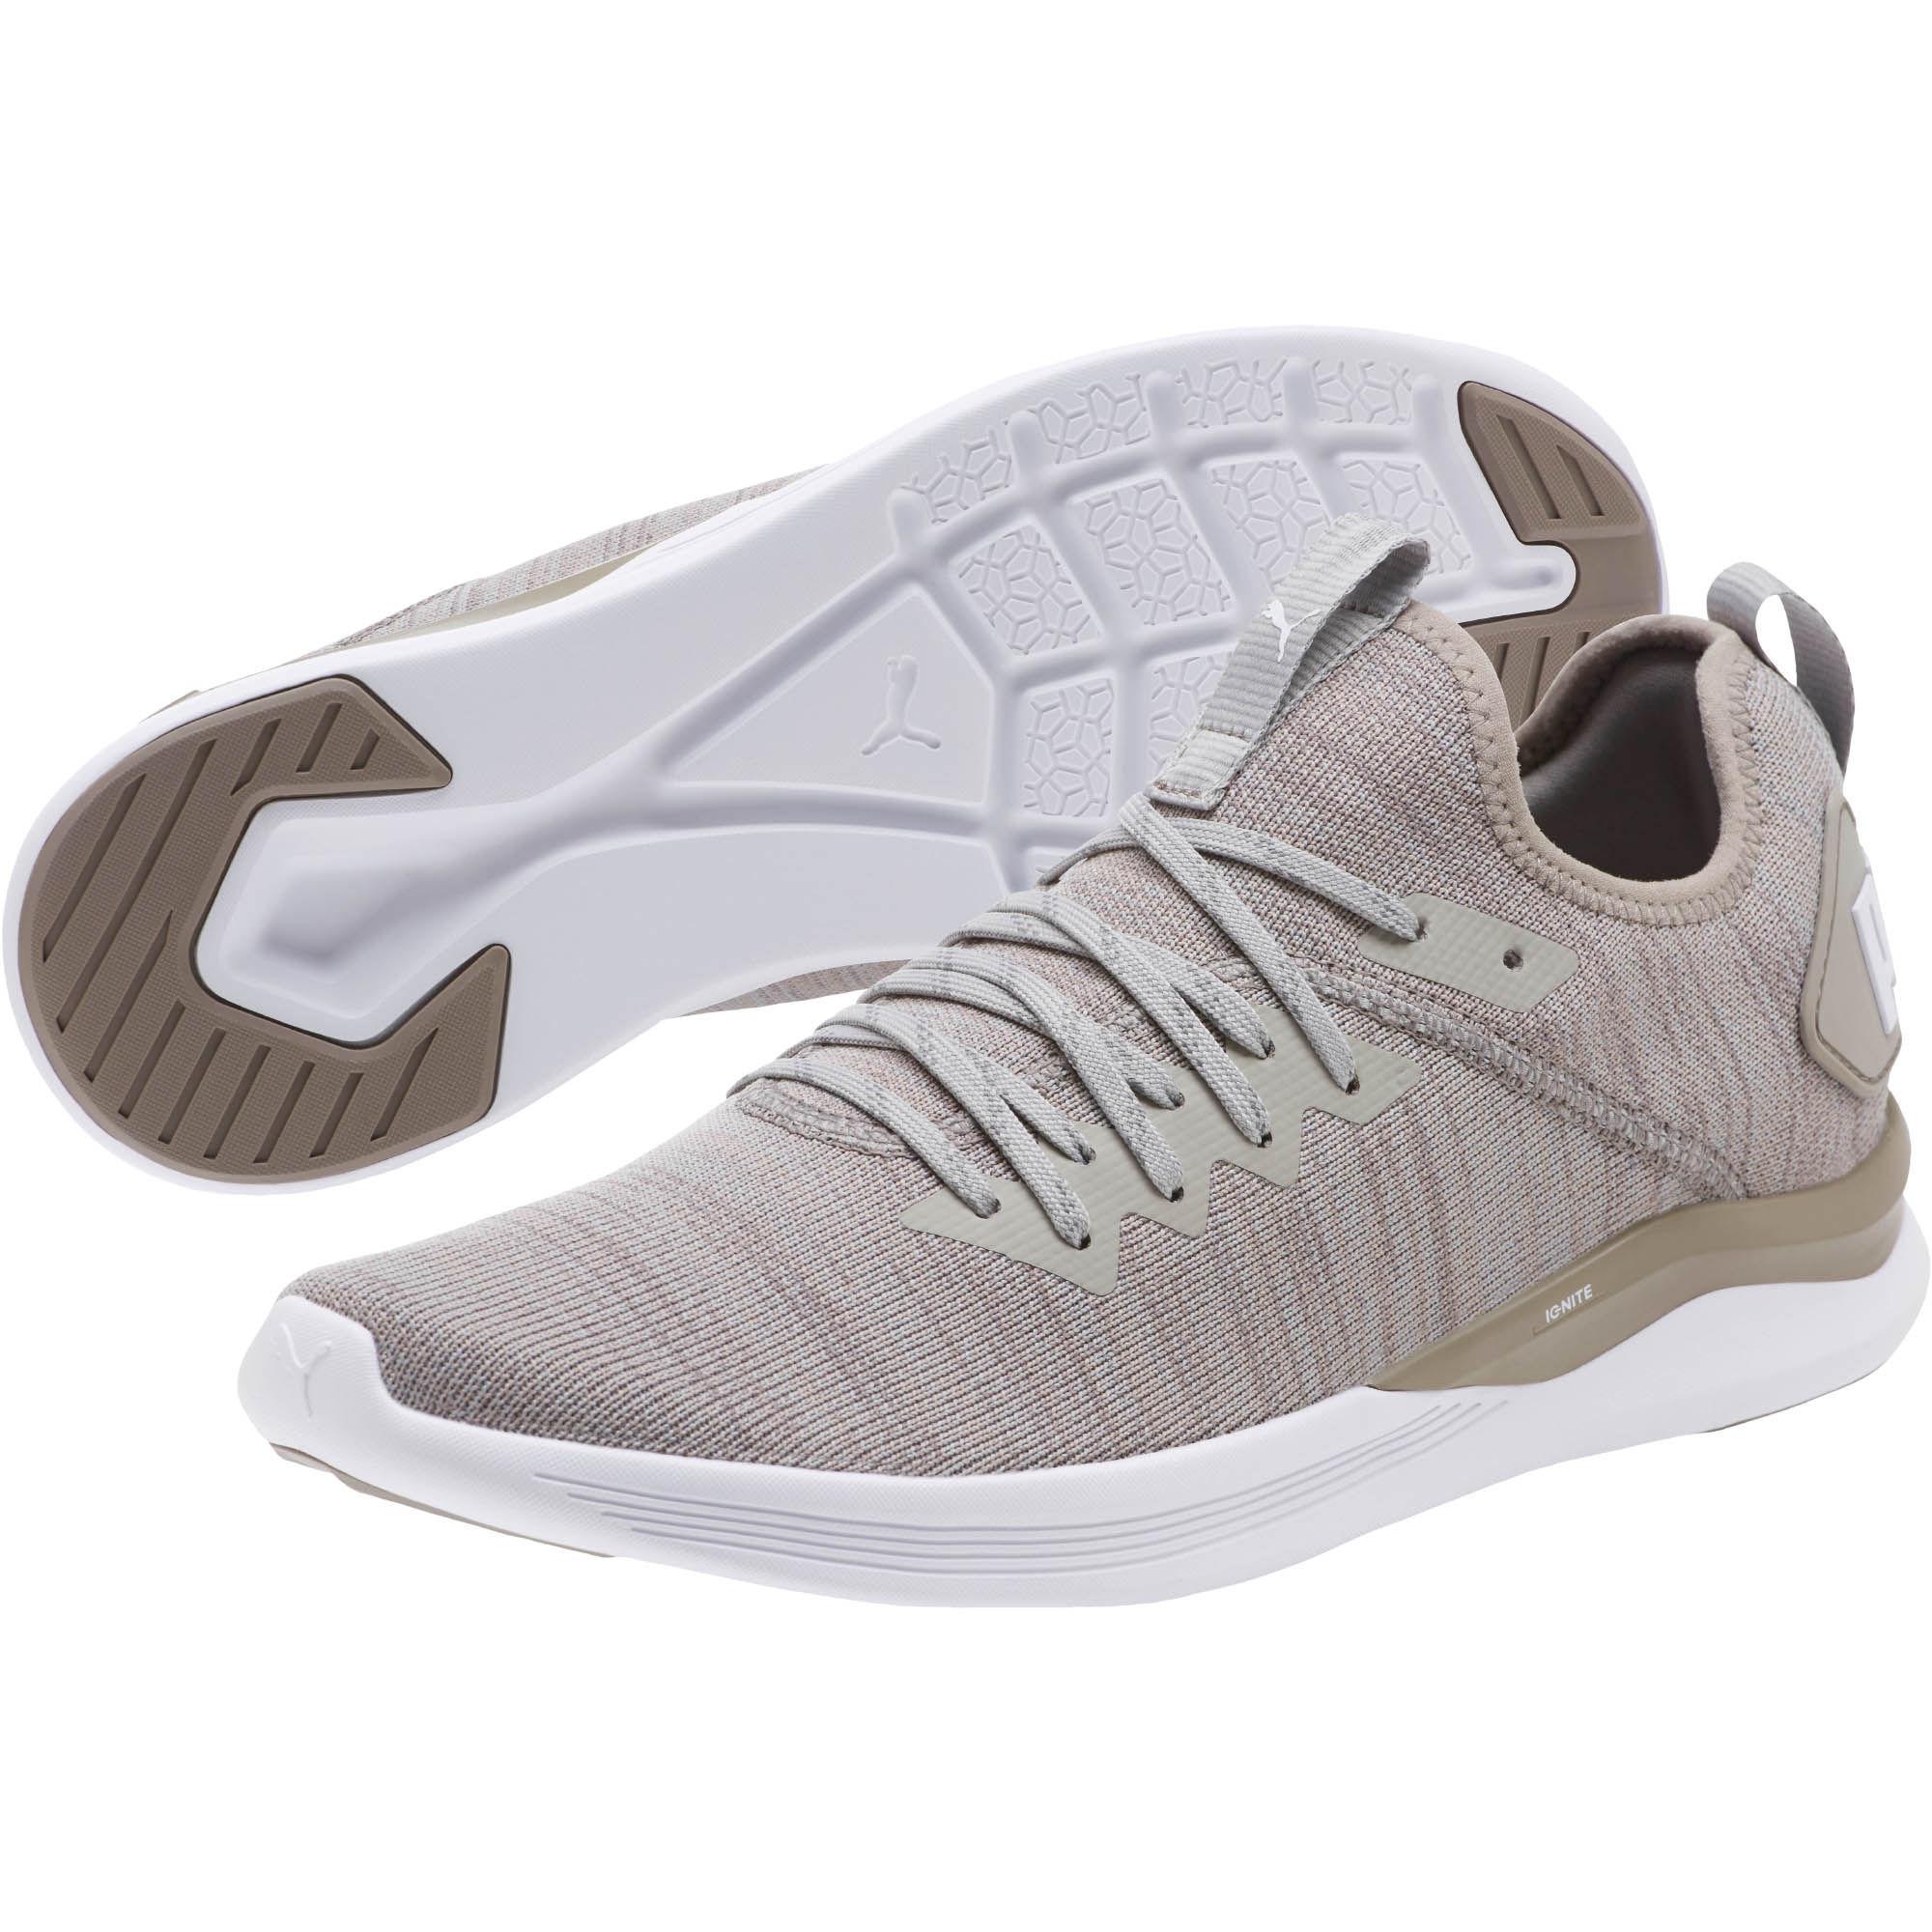 0ed8e7230f8602 Lyst - PUMA Ignite Flash Evoknit Men s Training Shoes for Men